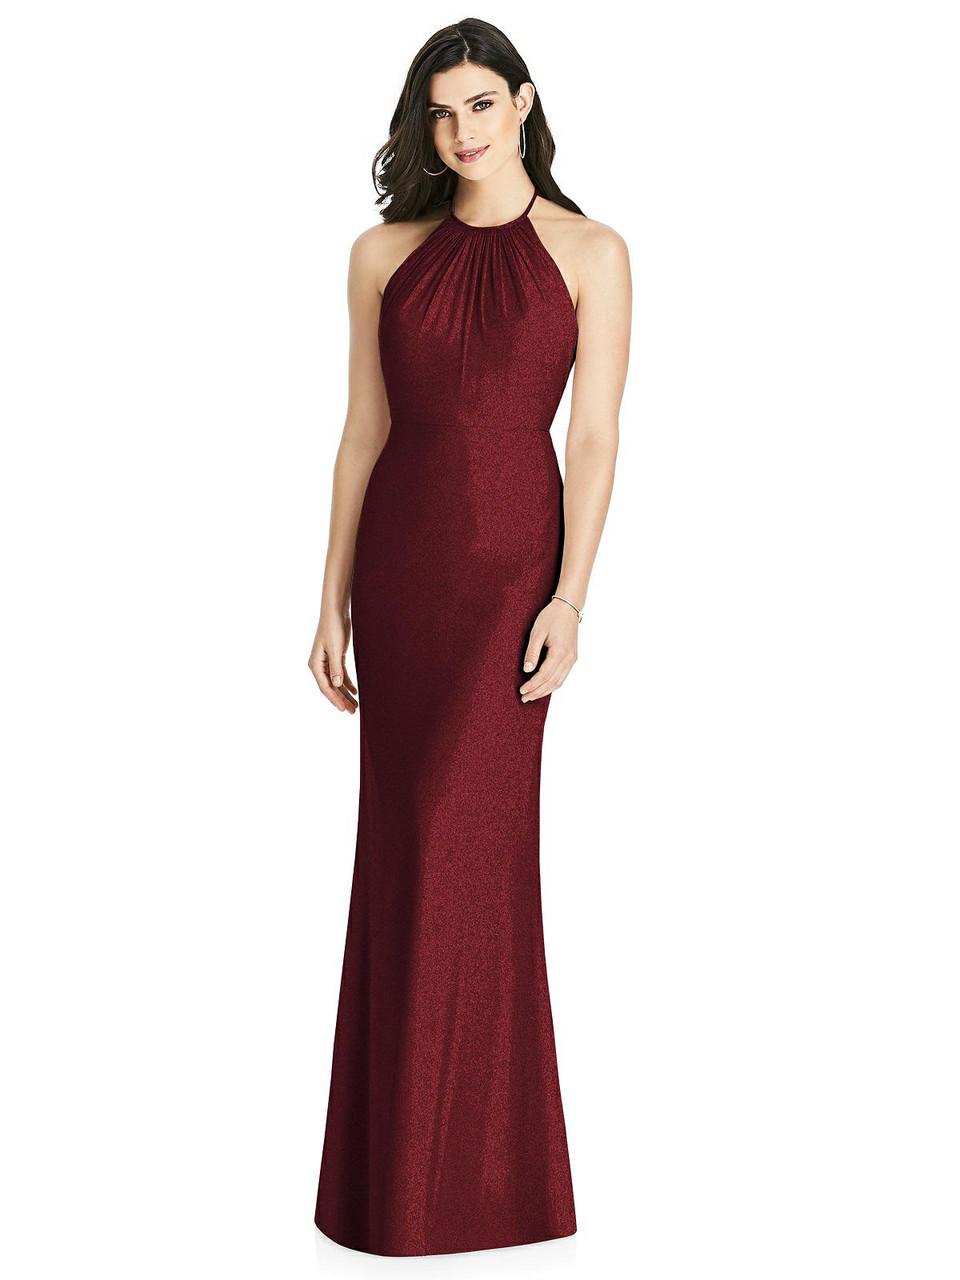 Dessy Shimmer Bridesmaid Dress 3022LS - Lux Shimmer